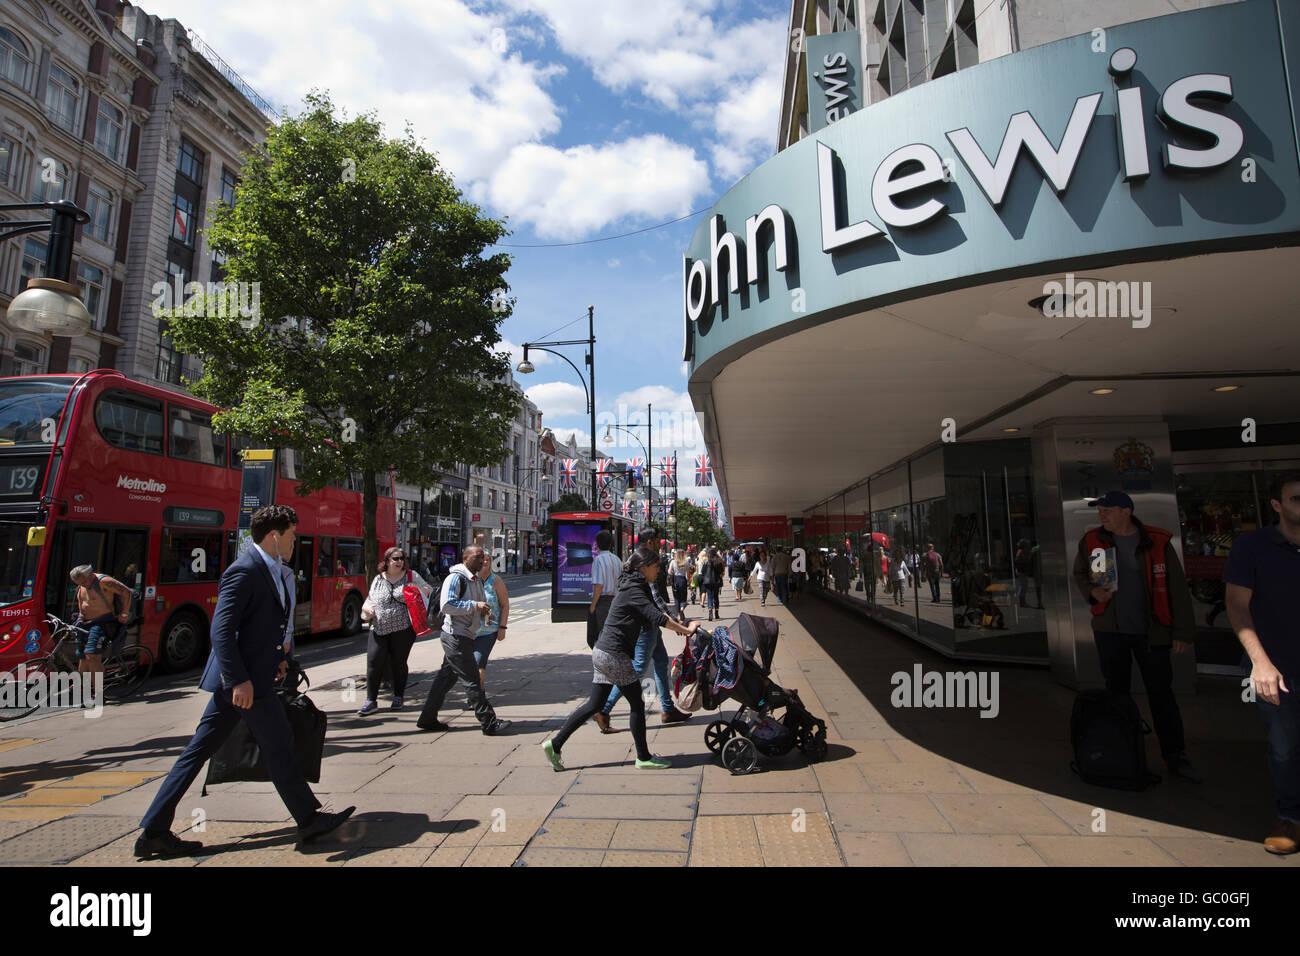 John Lewis department store exterior, main entrance on Oxford Street, London, England, United Kingdom - Stock Image